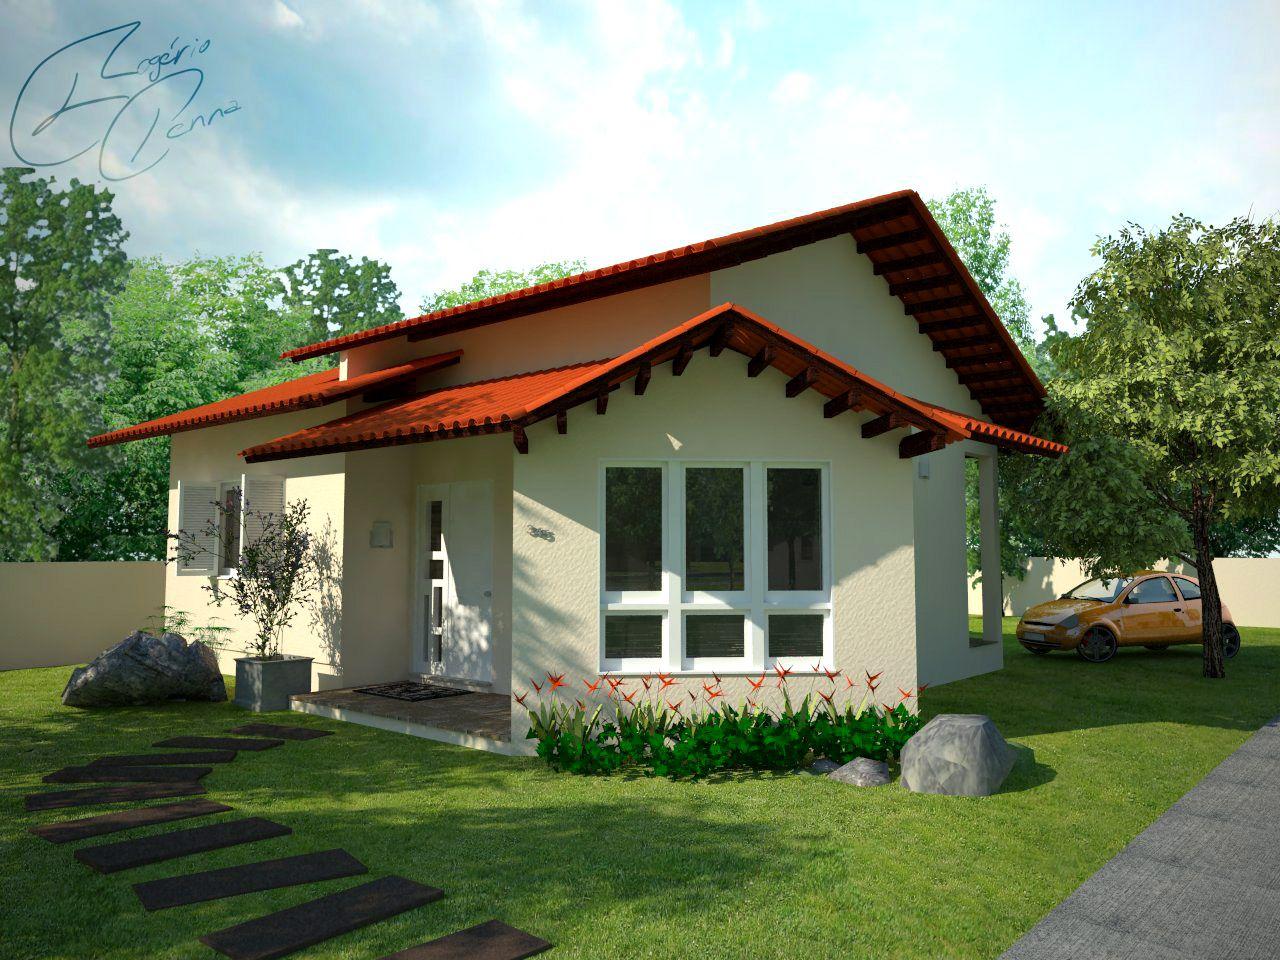 Modelos de casas modernas fotos de casas modernas for Imagenes de decoracion de interiores